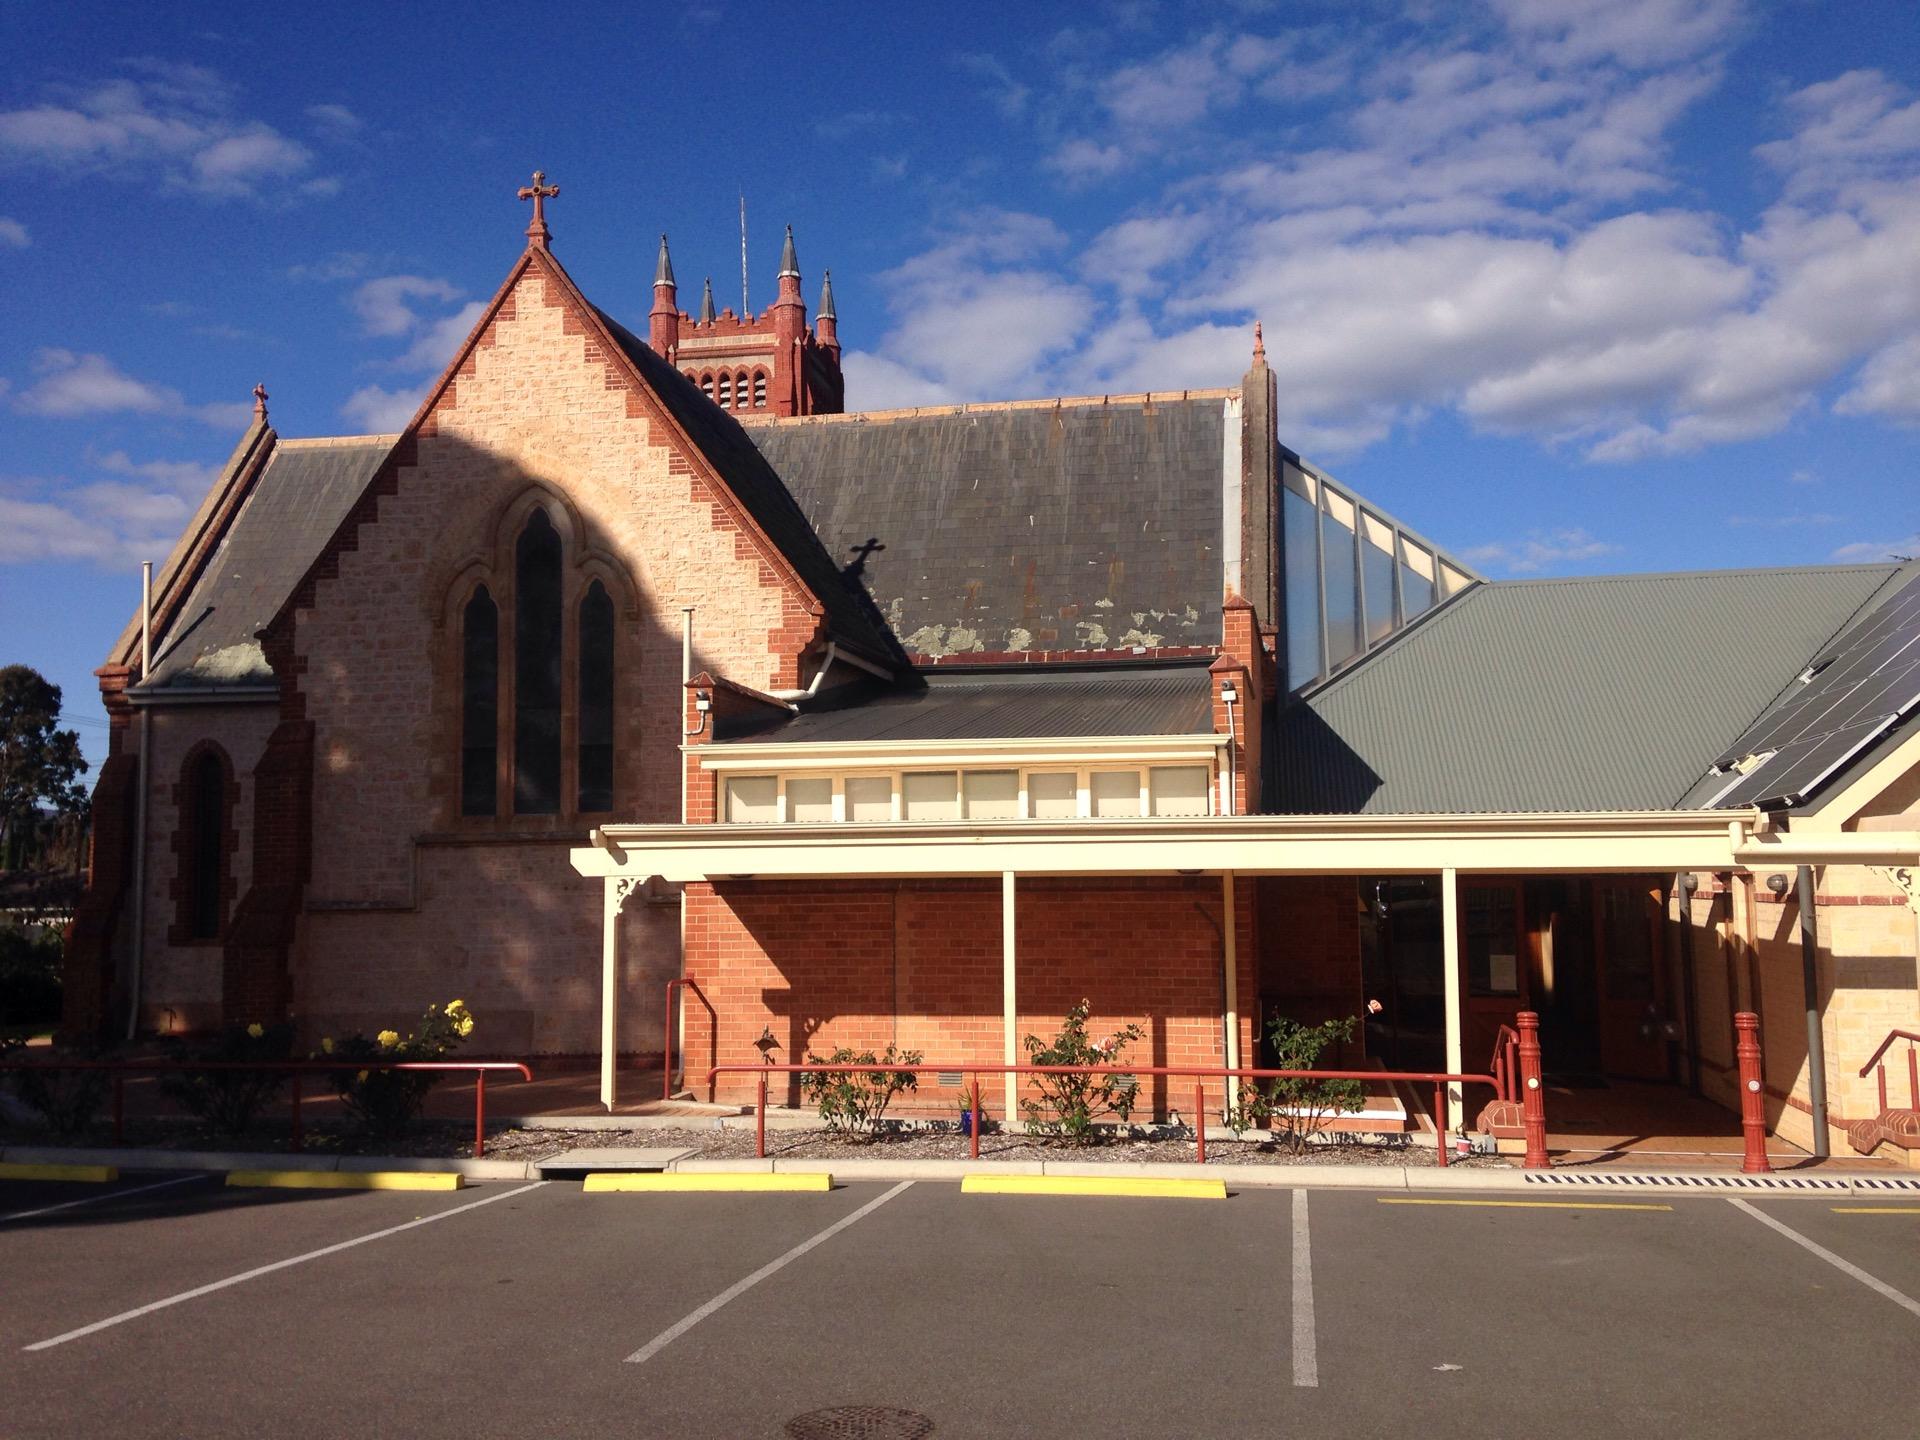 St. Andrews Church Walkerville   43 Church Terrace, Walkerville, South Australia 5081   +61 8 8269 5420